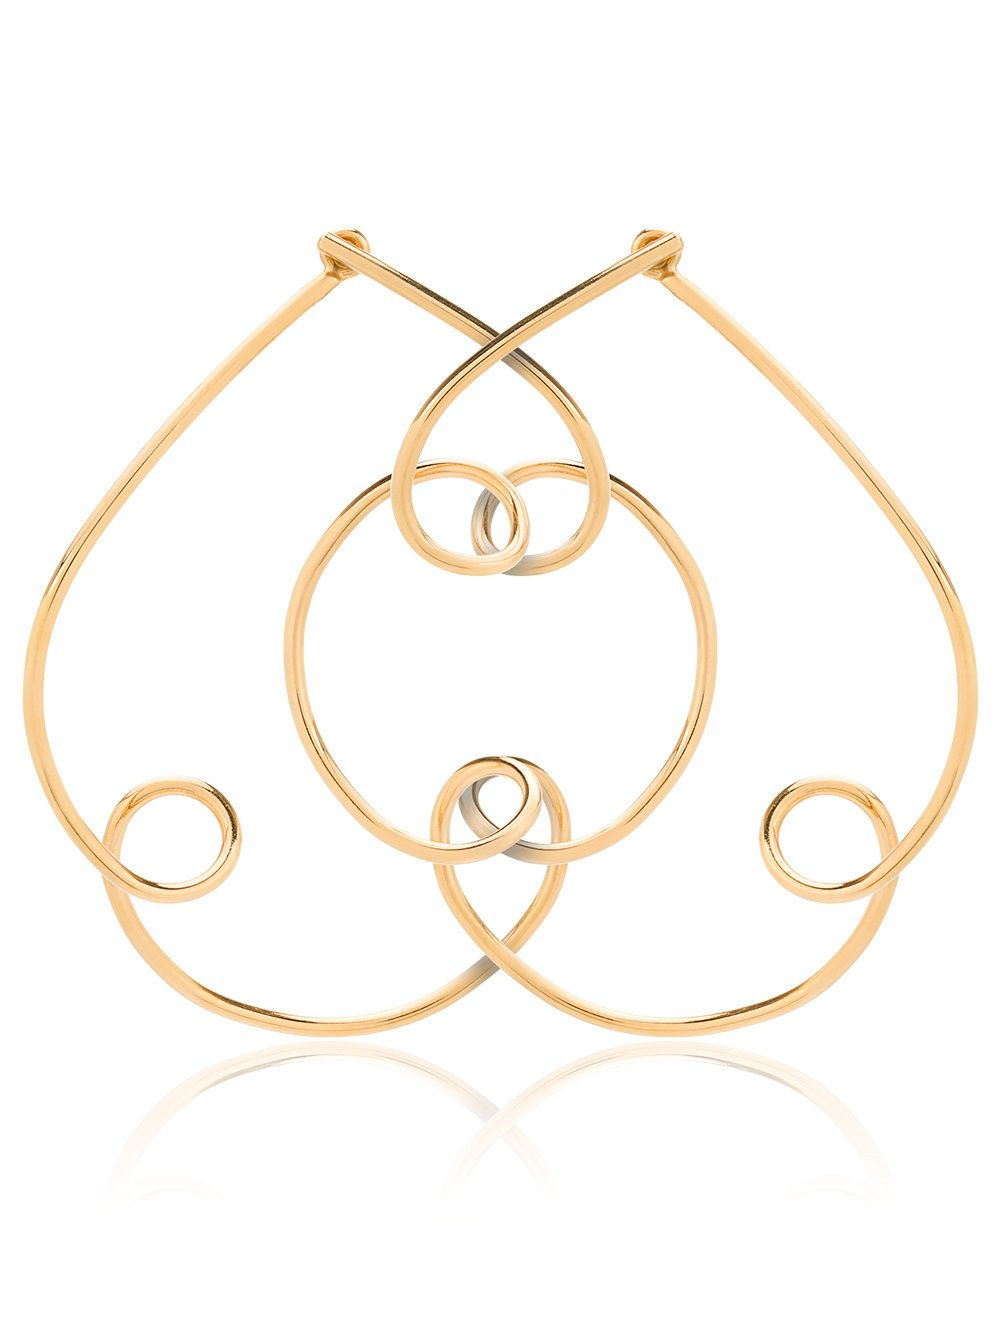 Holly Ryan 18k gold plated cloud earrings jUmiQ